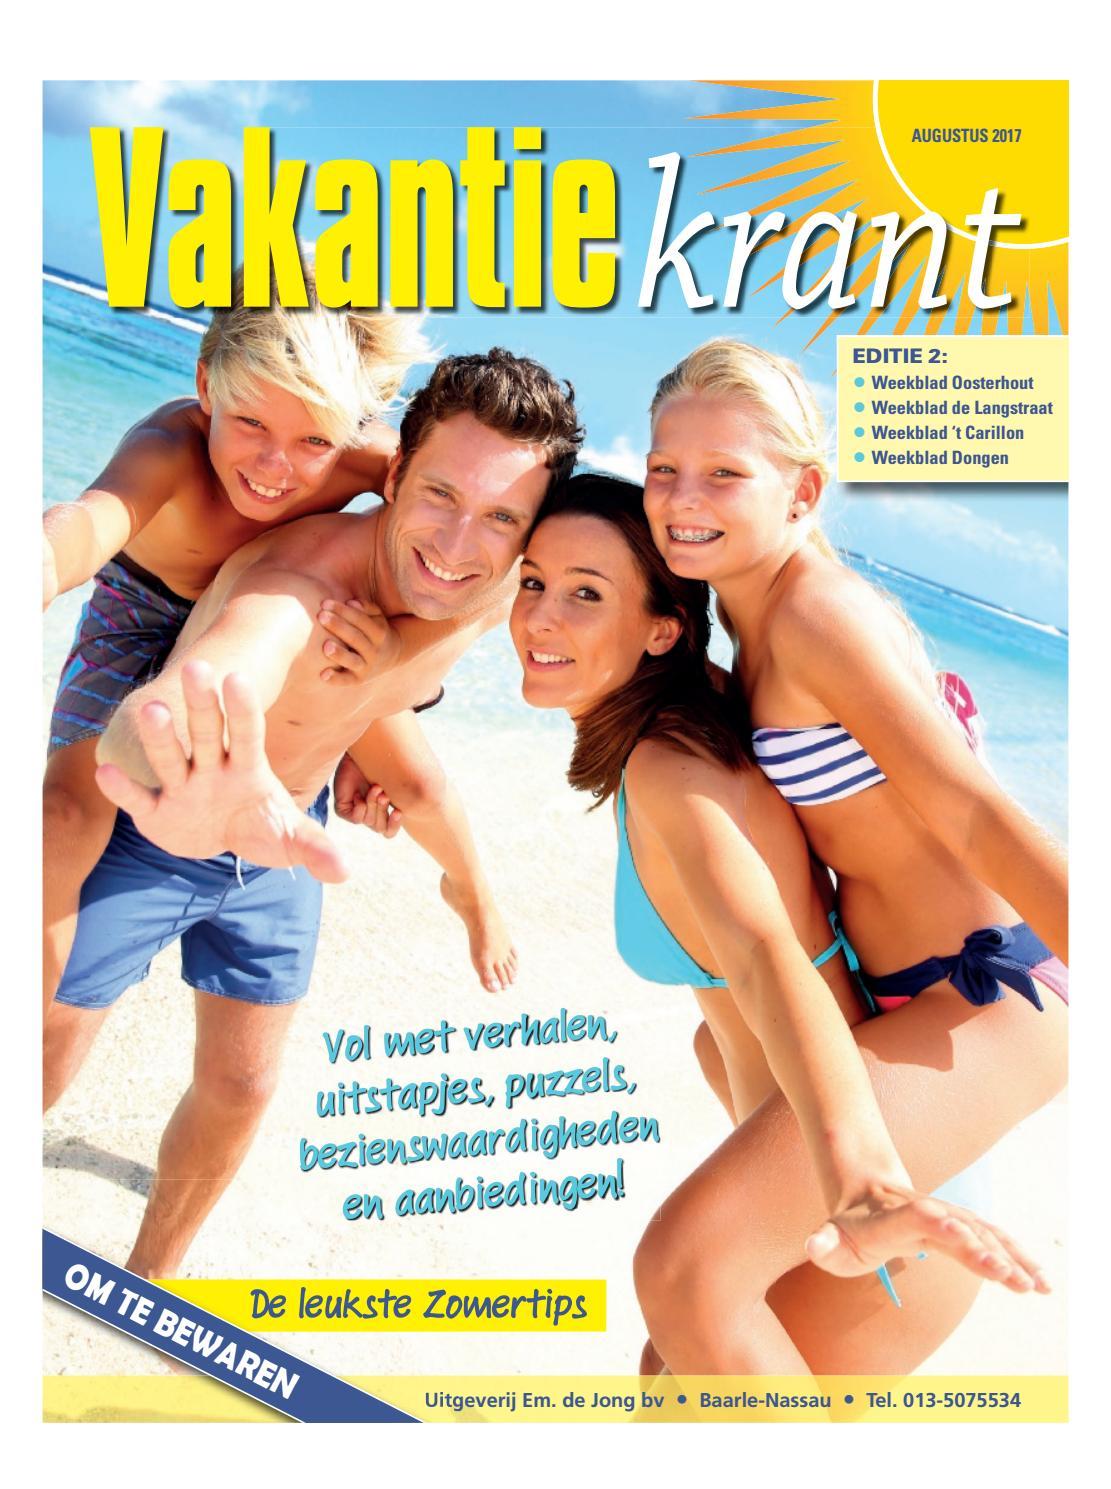 Vakantiekrant ed 2 02 08 2017 by uitgeverij em de jong for Nassau indus deur bv oosterhout